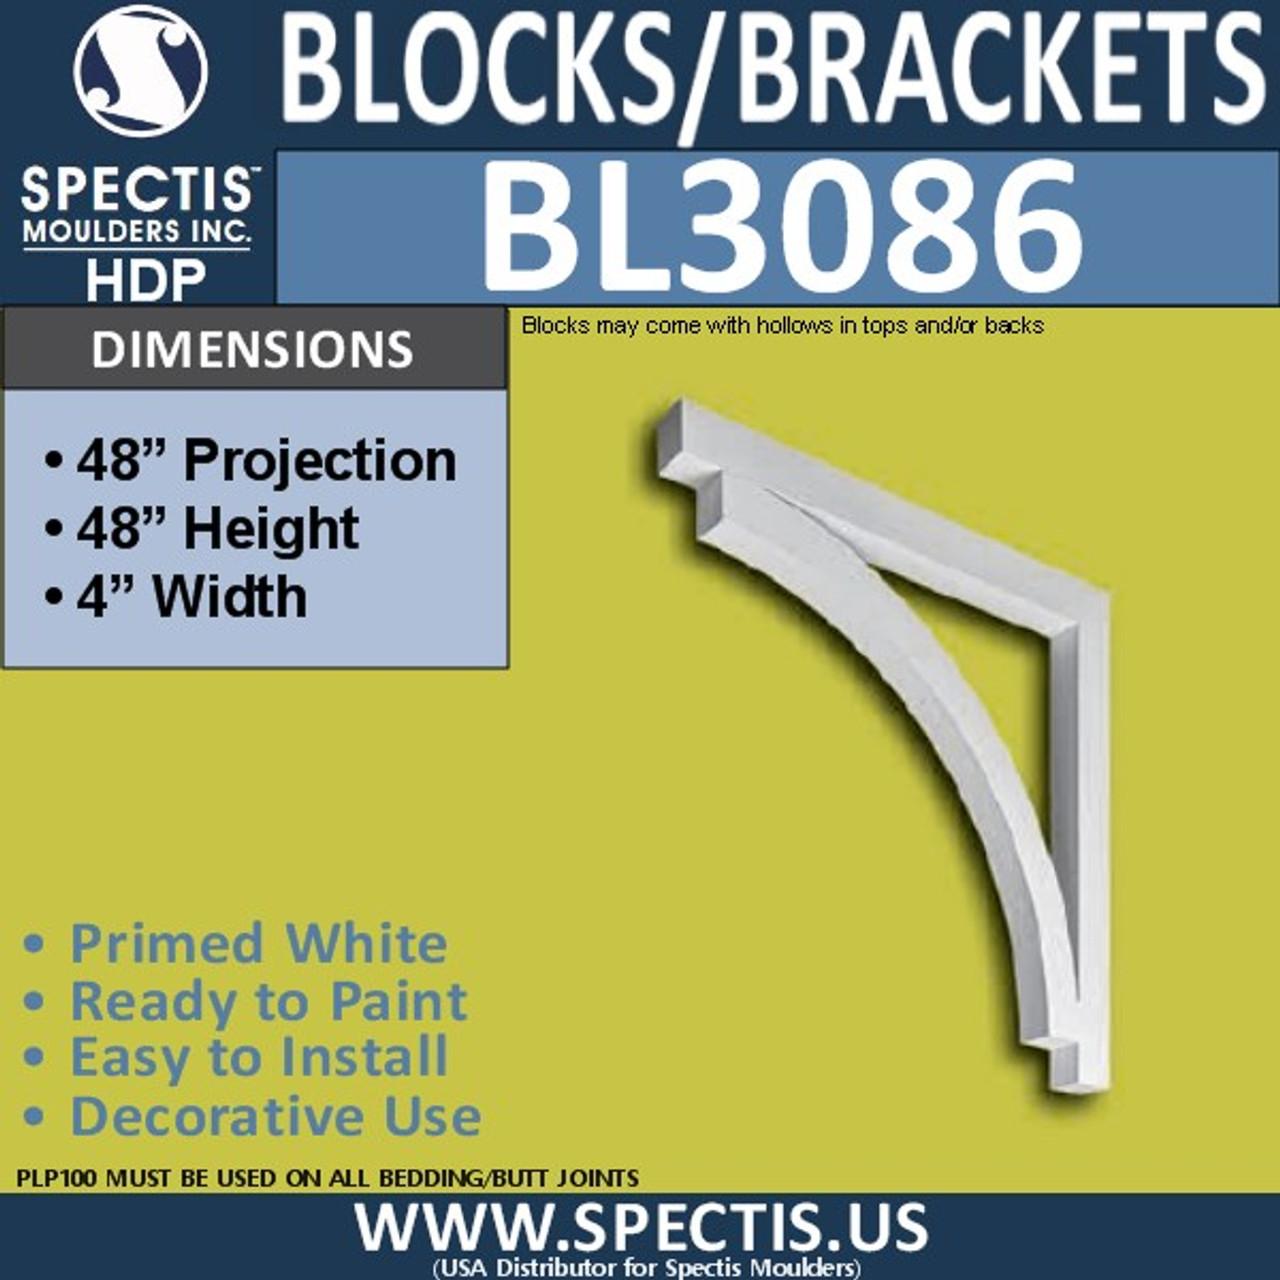 "BL3086 Eave Block or Bracket 4""W x 48""H x 48"" P"